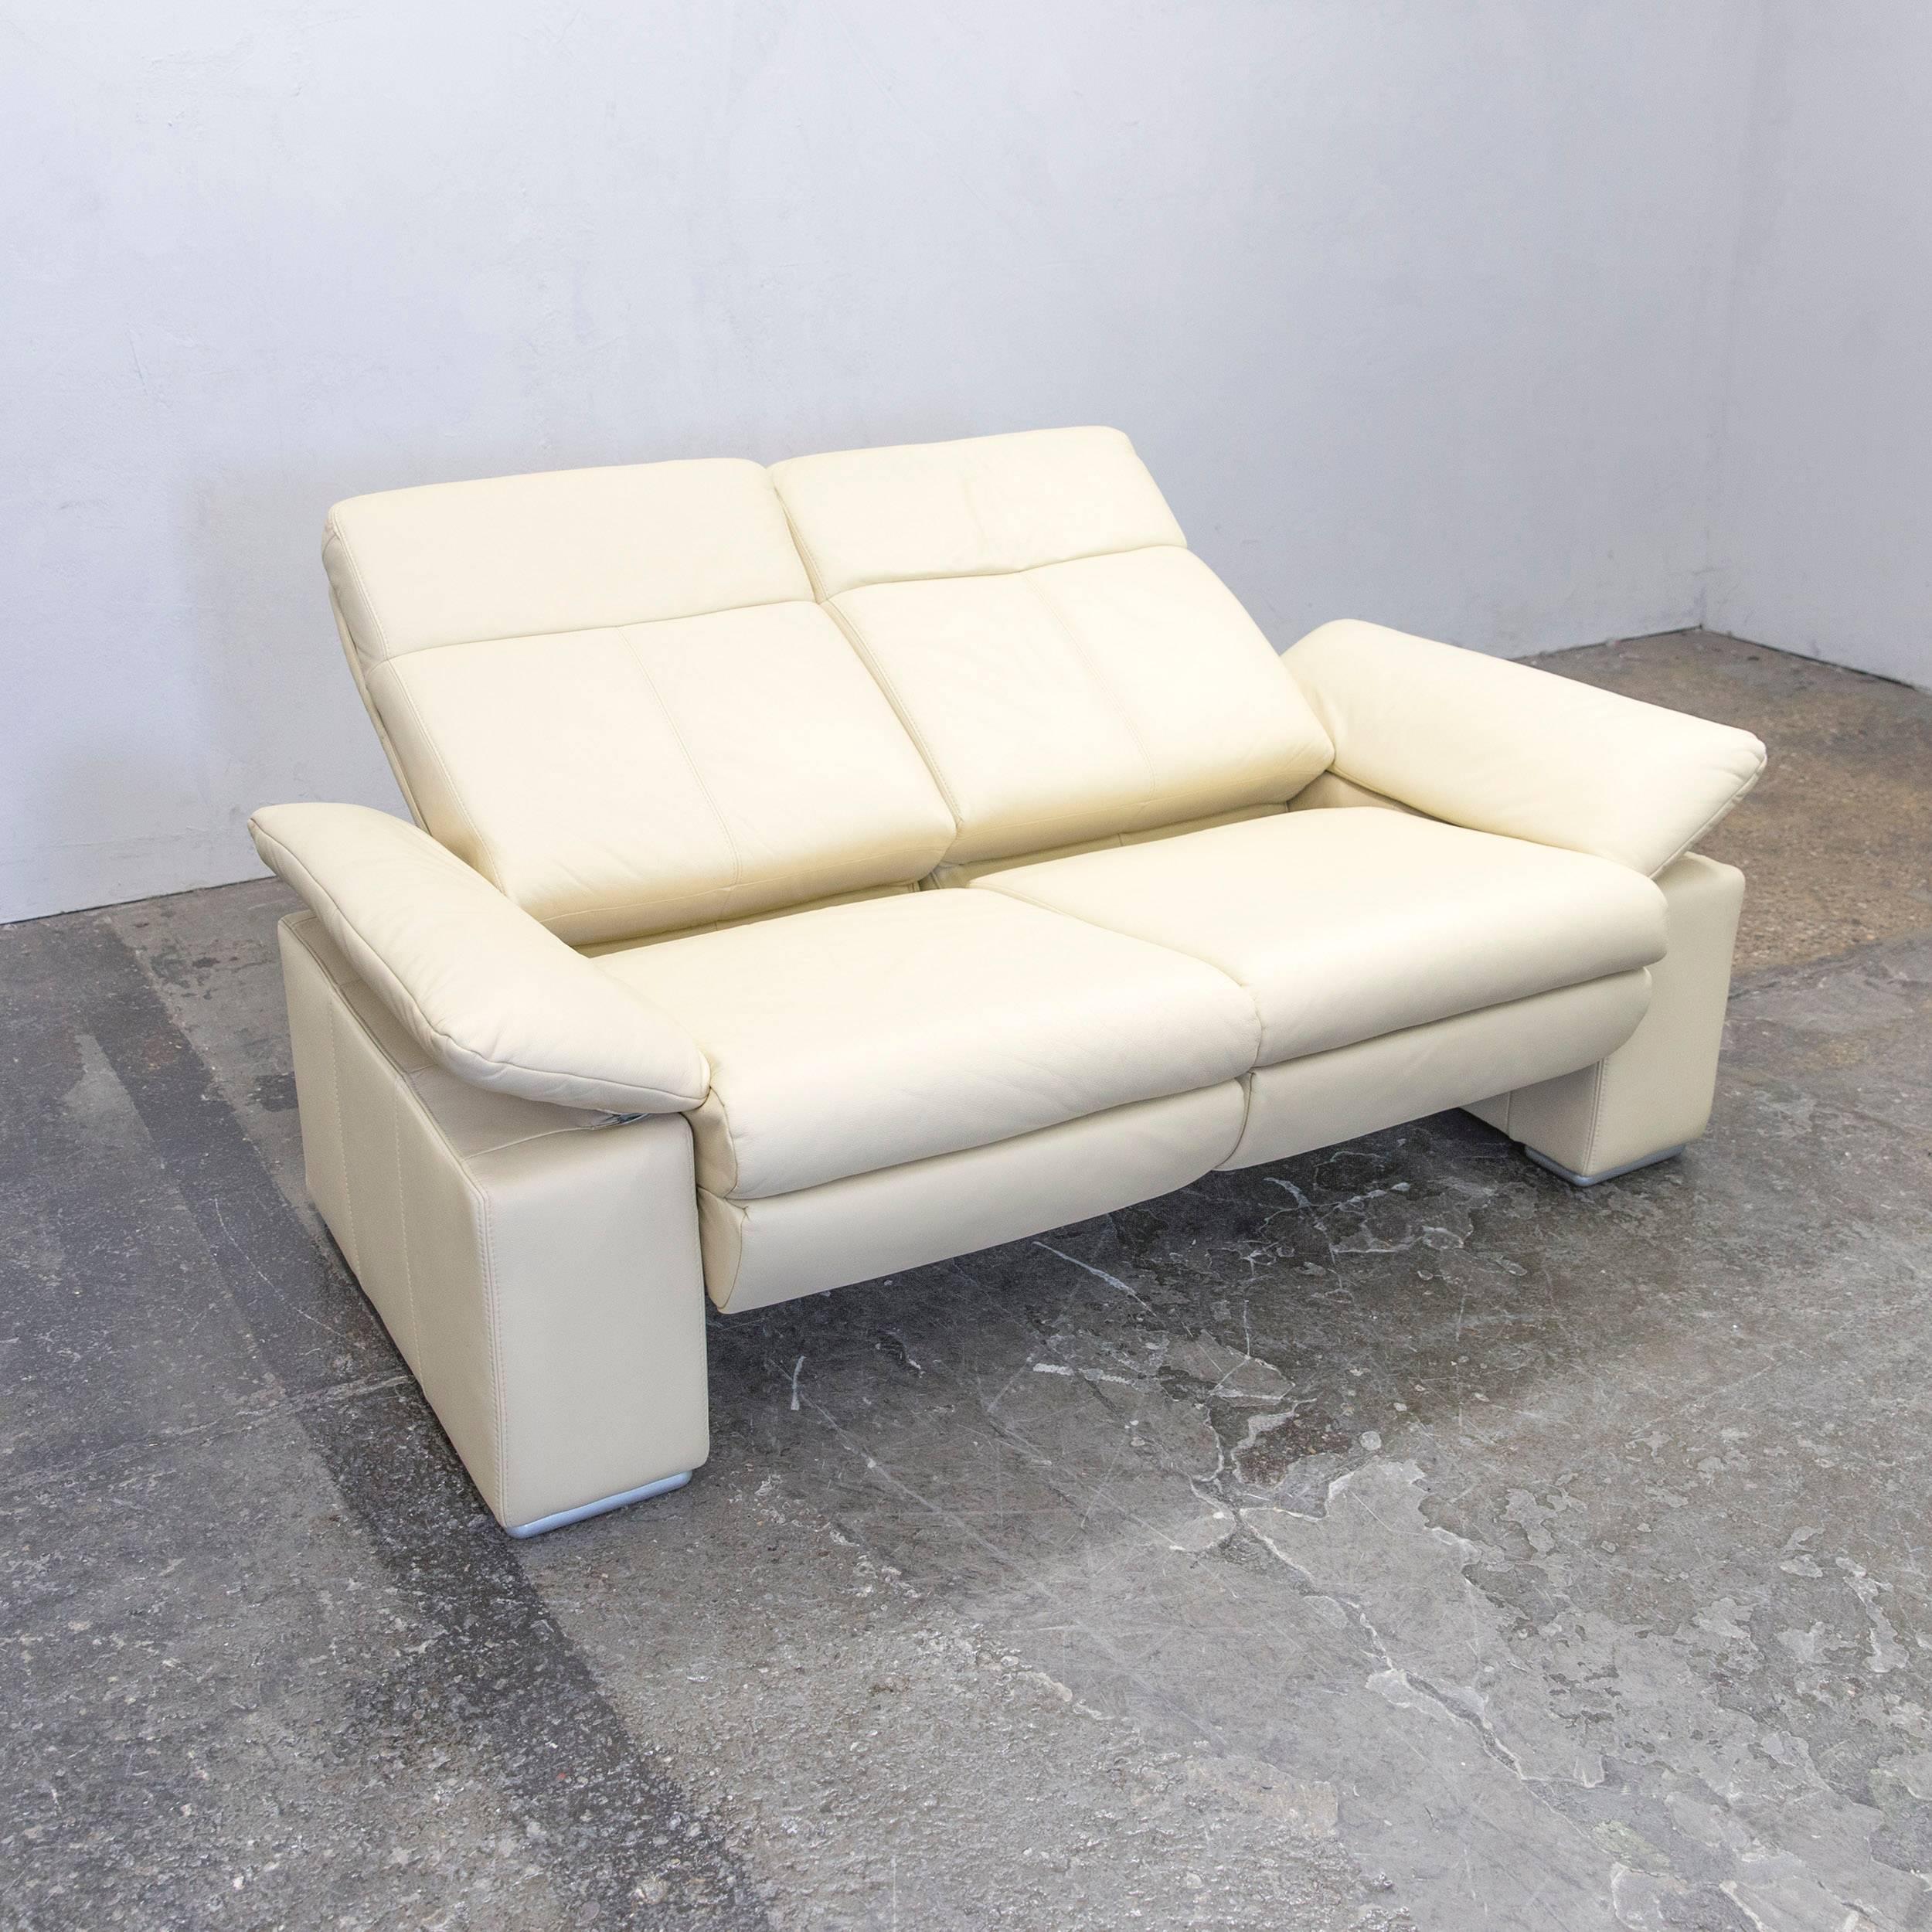 Wunderbar Sofas Musterring Galerie Hauptinnenideen kakados